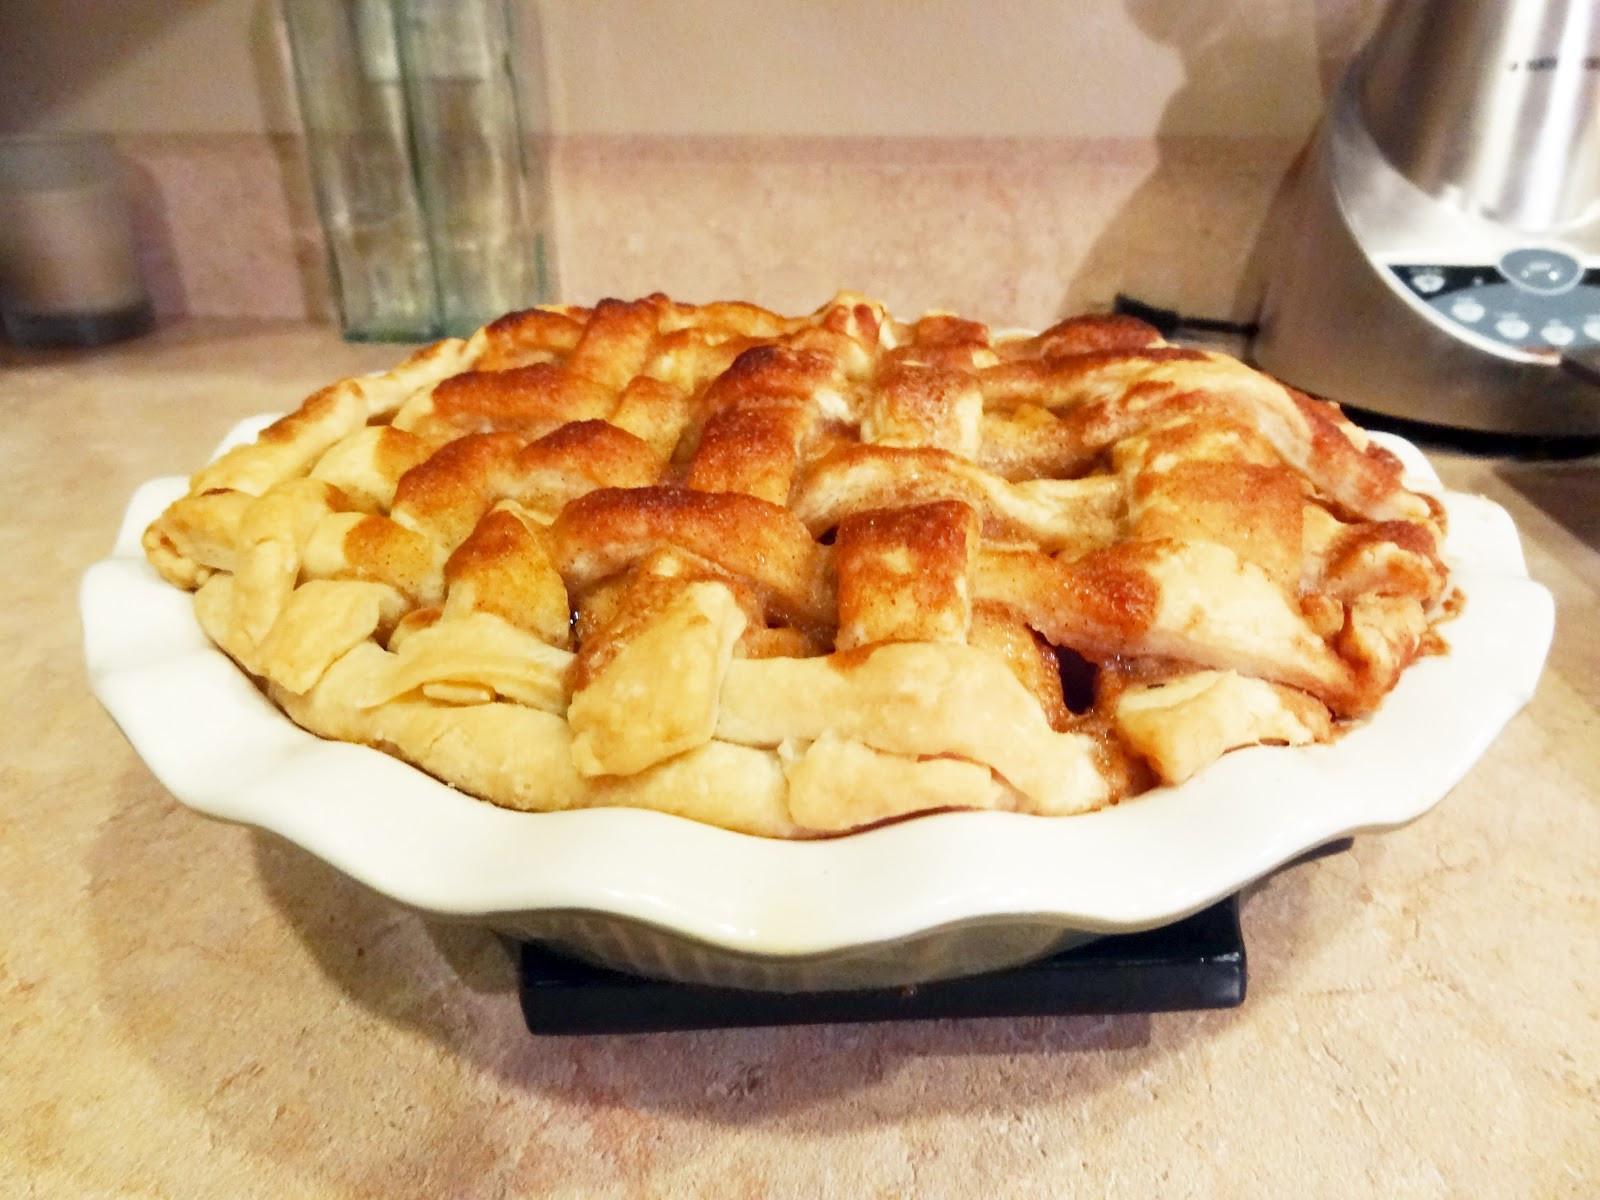 Best Apple Pie Apples  The Sassy Italian The BEST Apple Pie Recipe